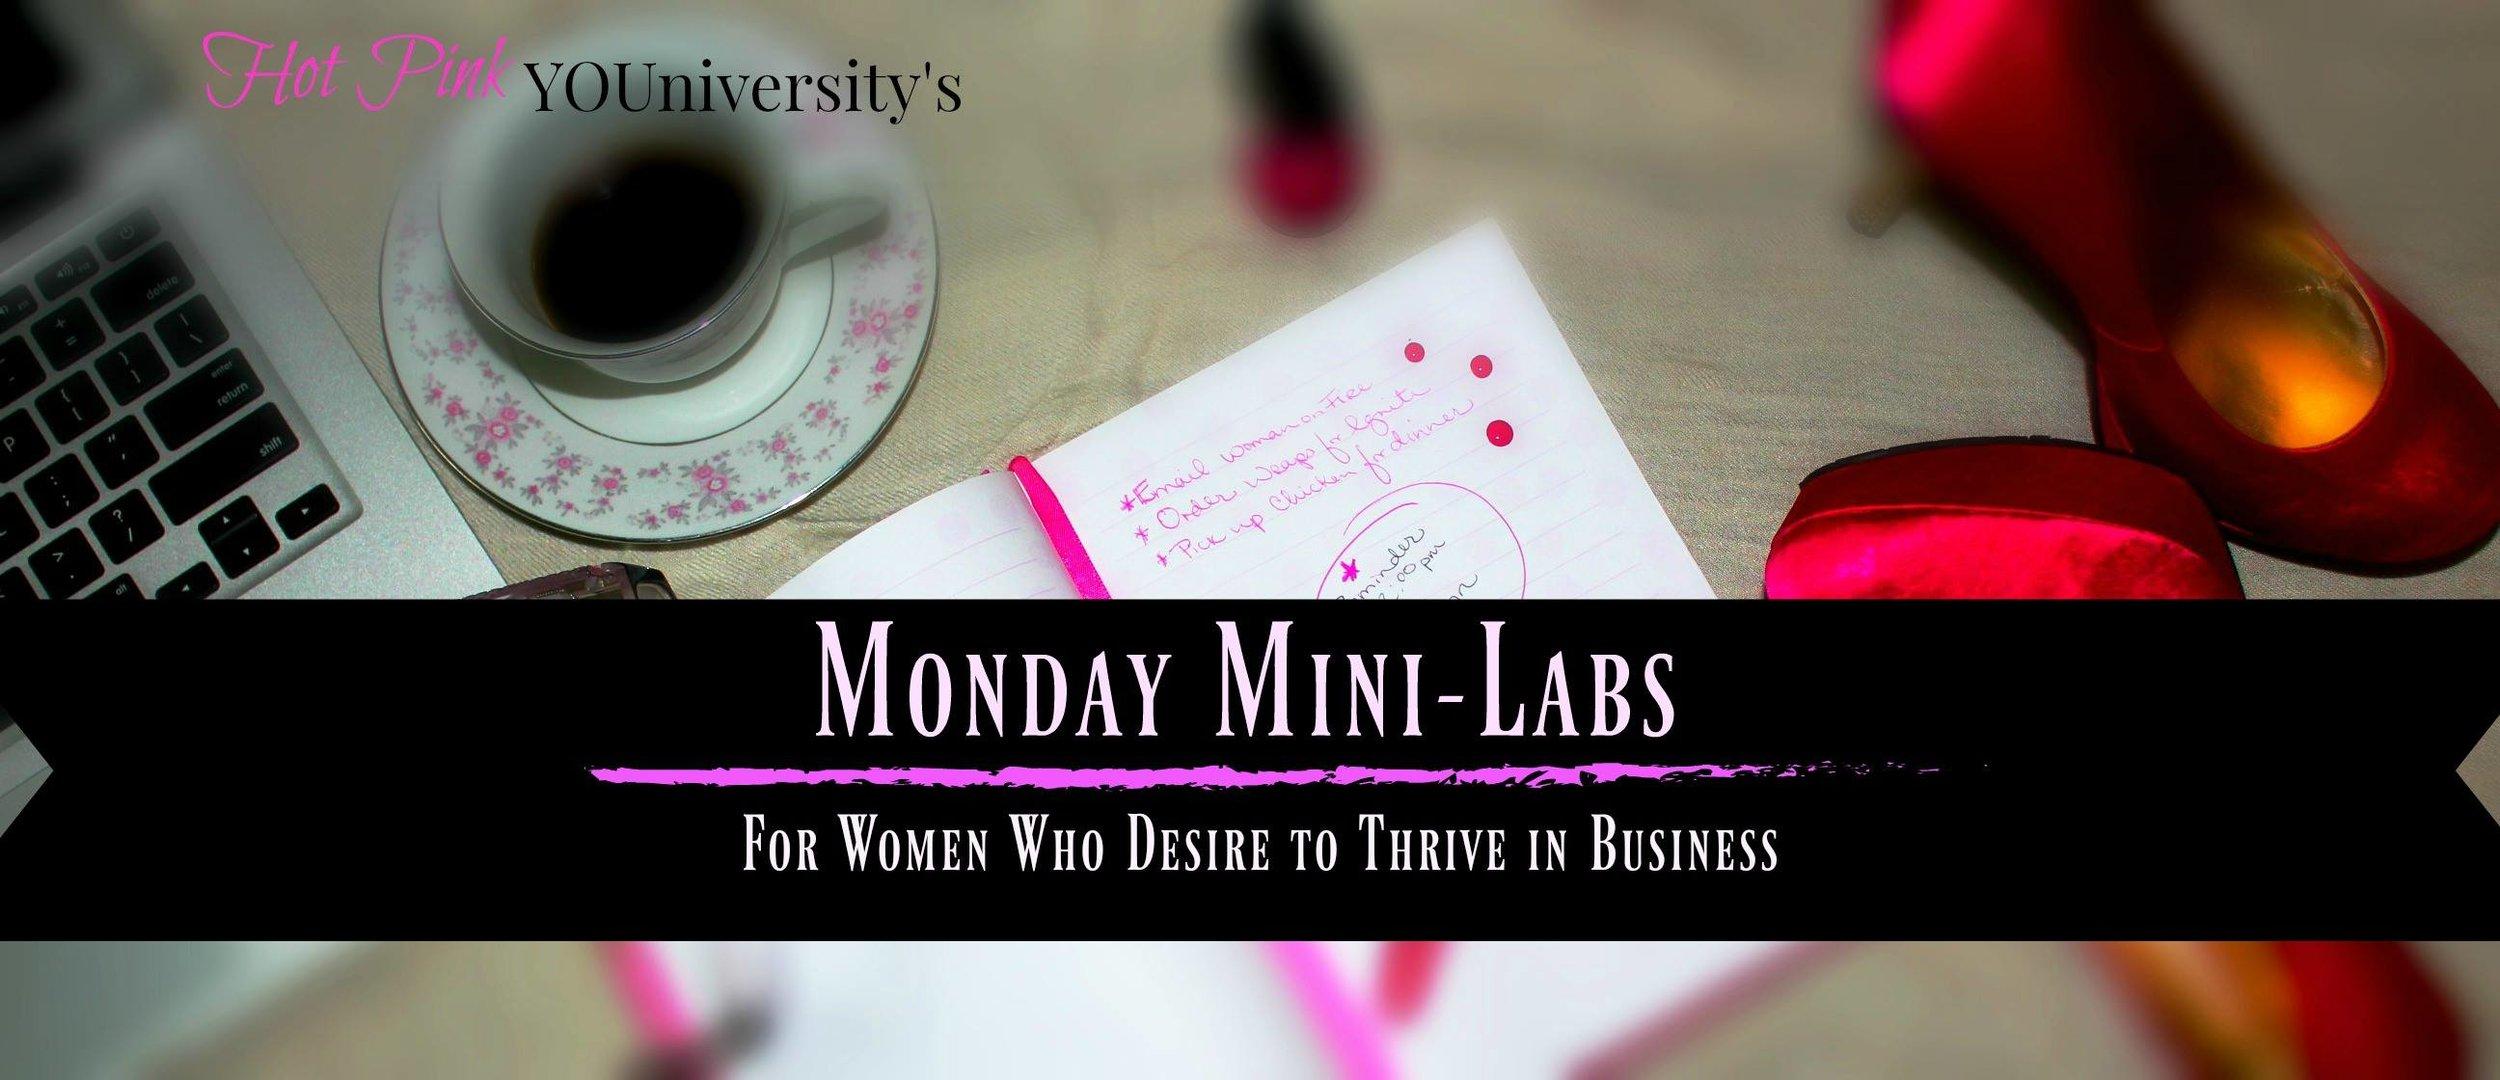 Monday-mini-labs-banner.jpg